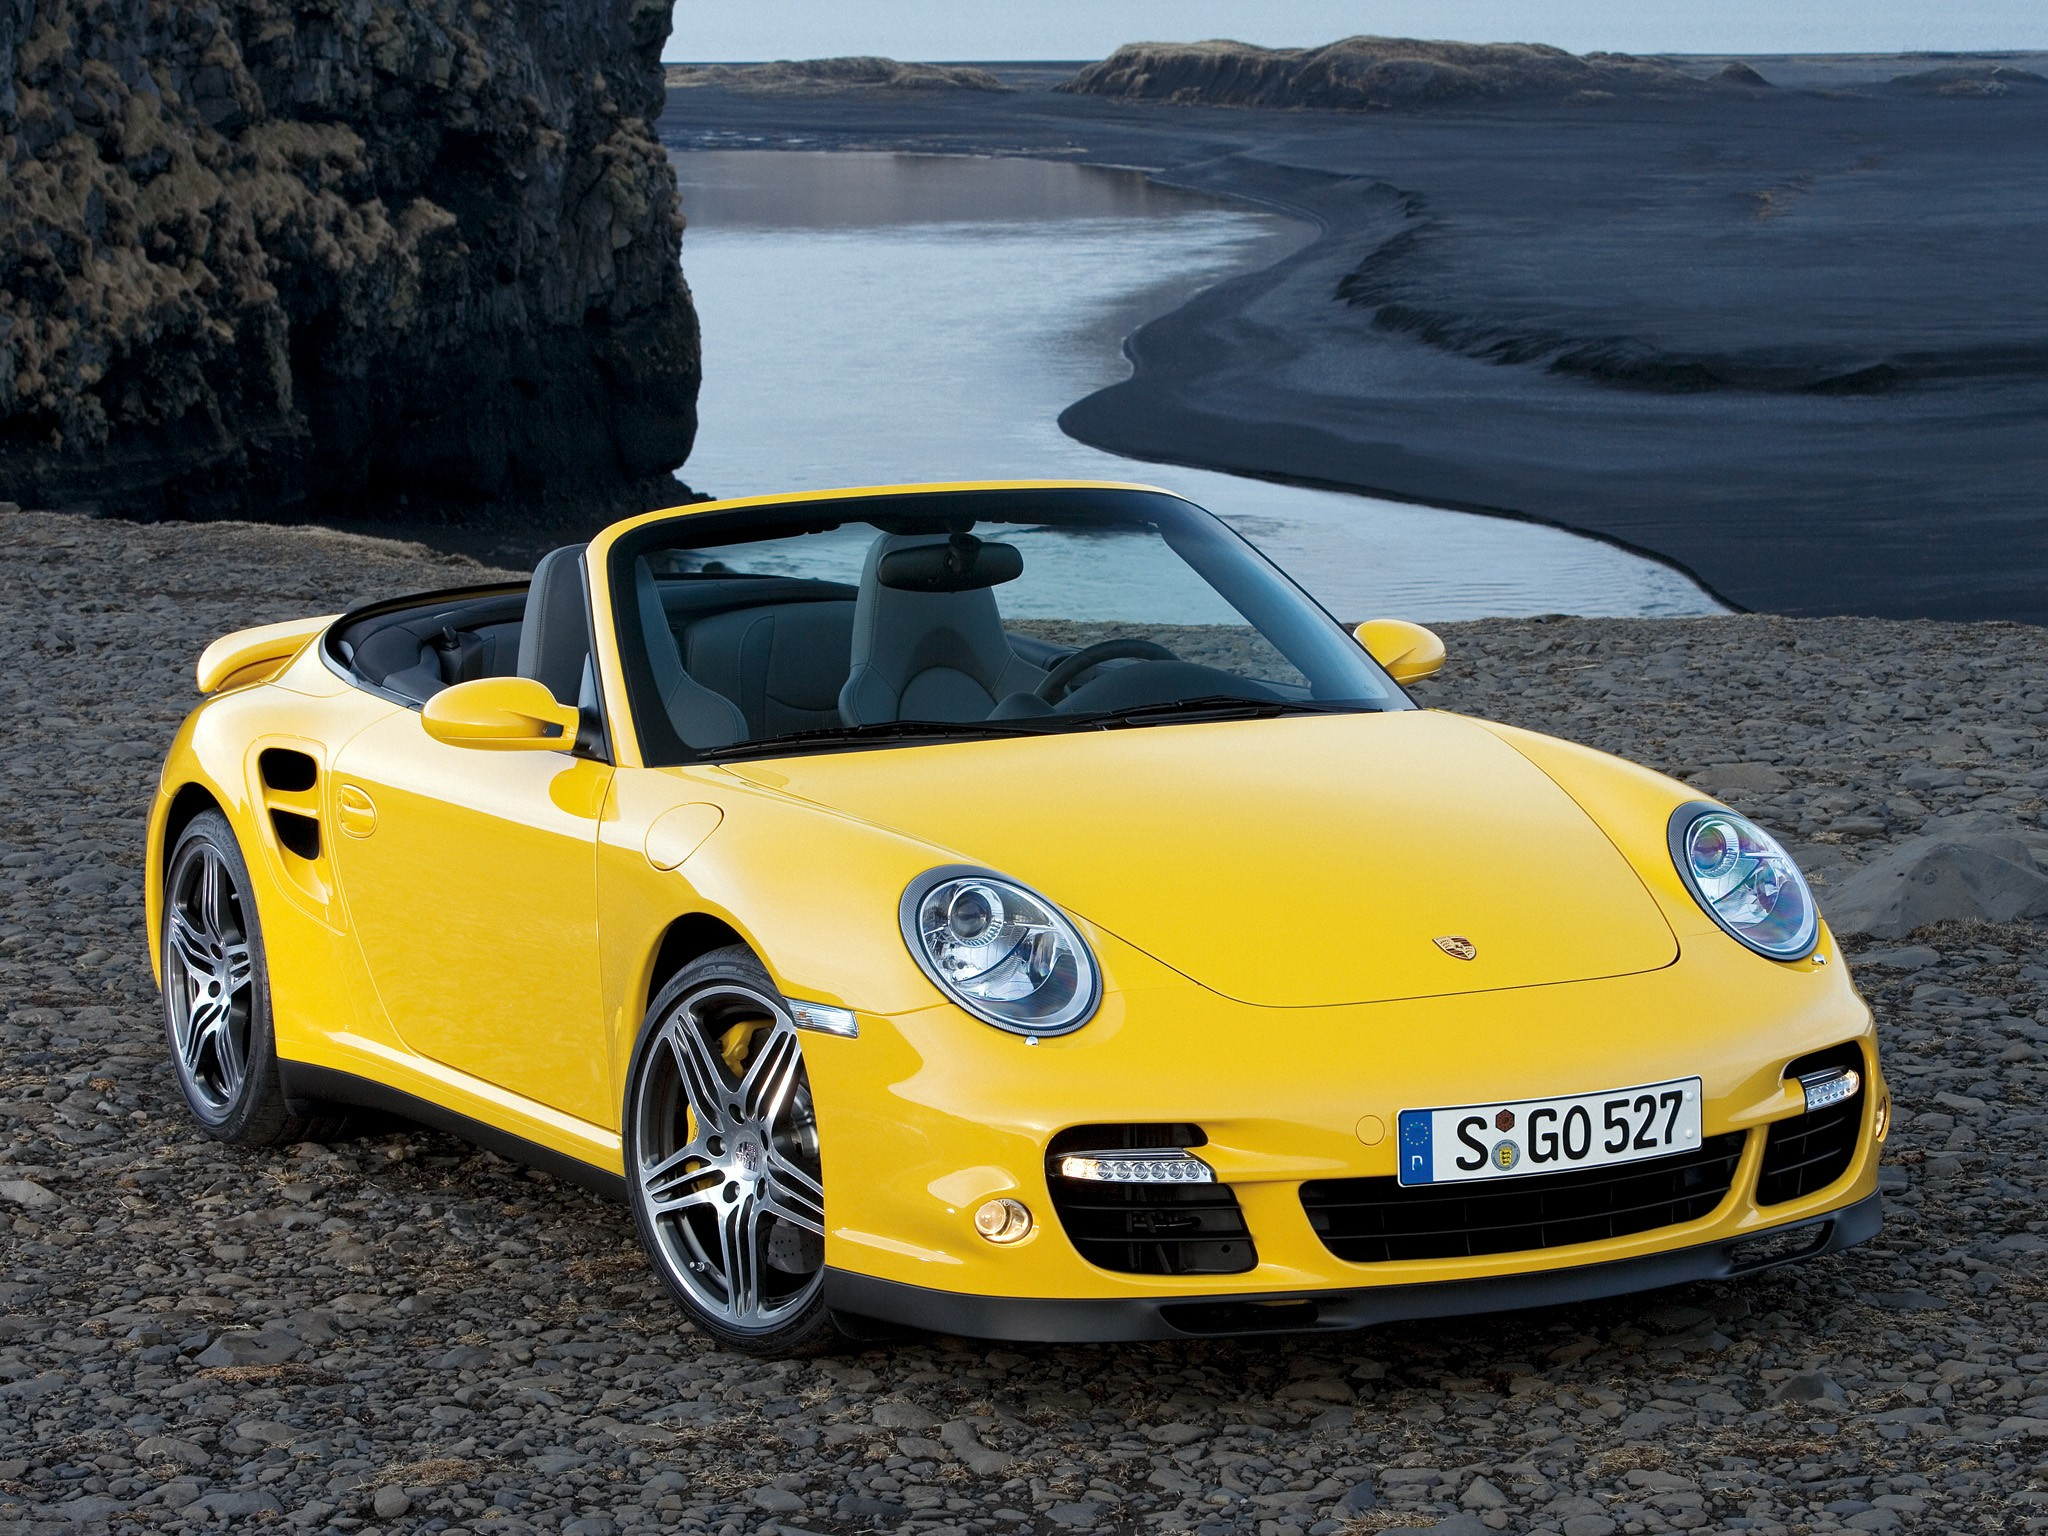 Porsche 911 Turbo Cabriolet 997 Specs 2007 2008 2009